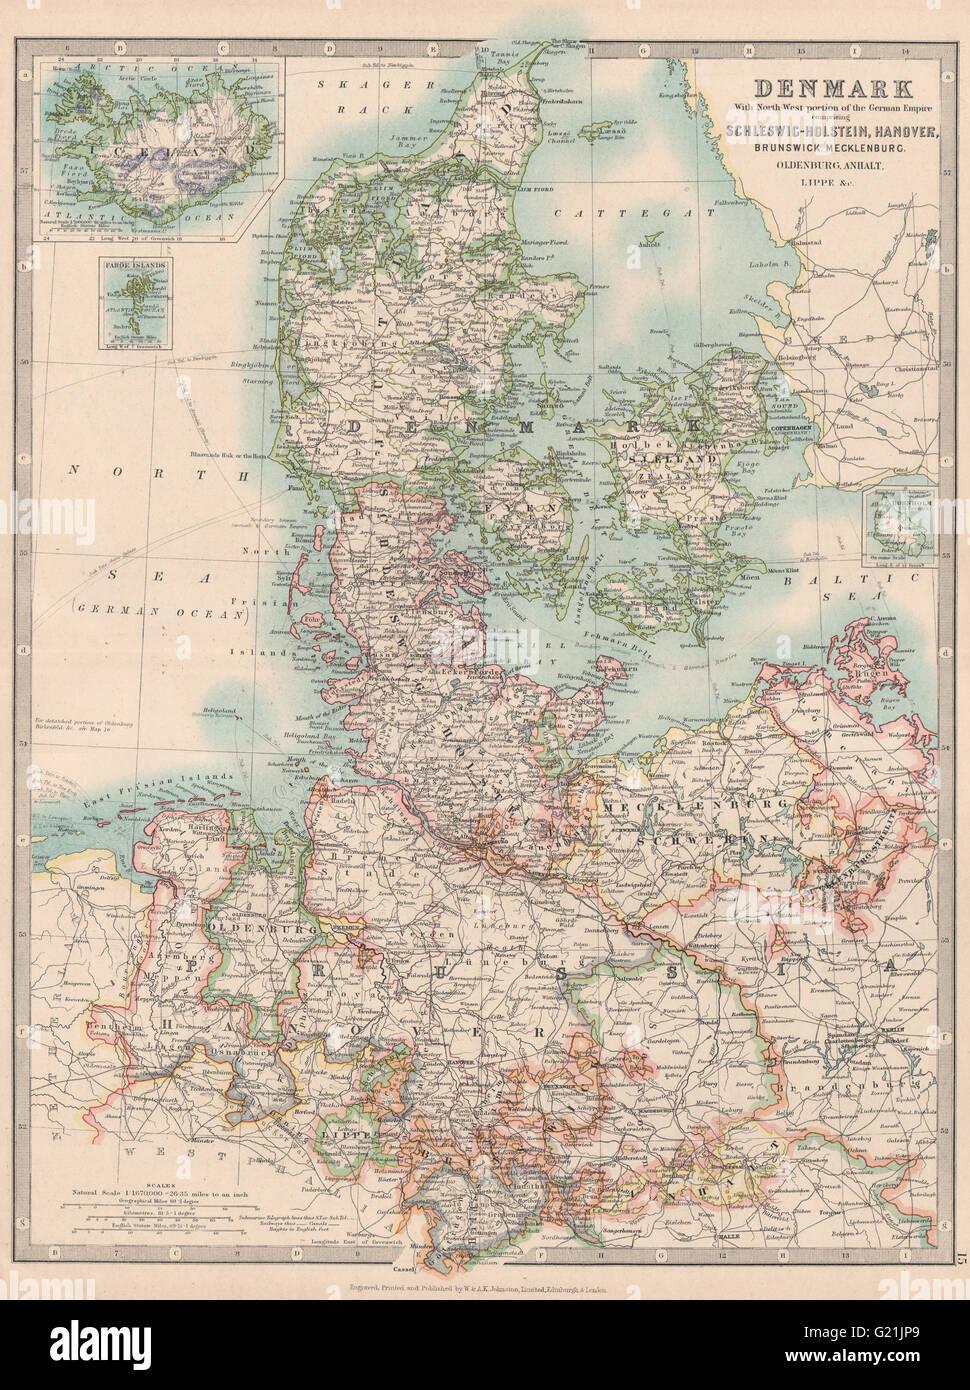 Map Of Northern Germany And Denmark.Denmark Northern Germany Schleswig Holstein Hanover Johnston